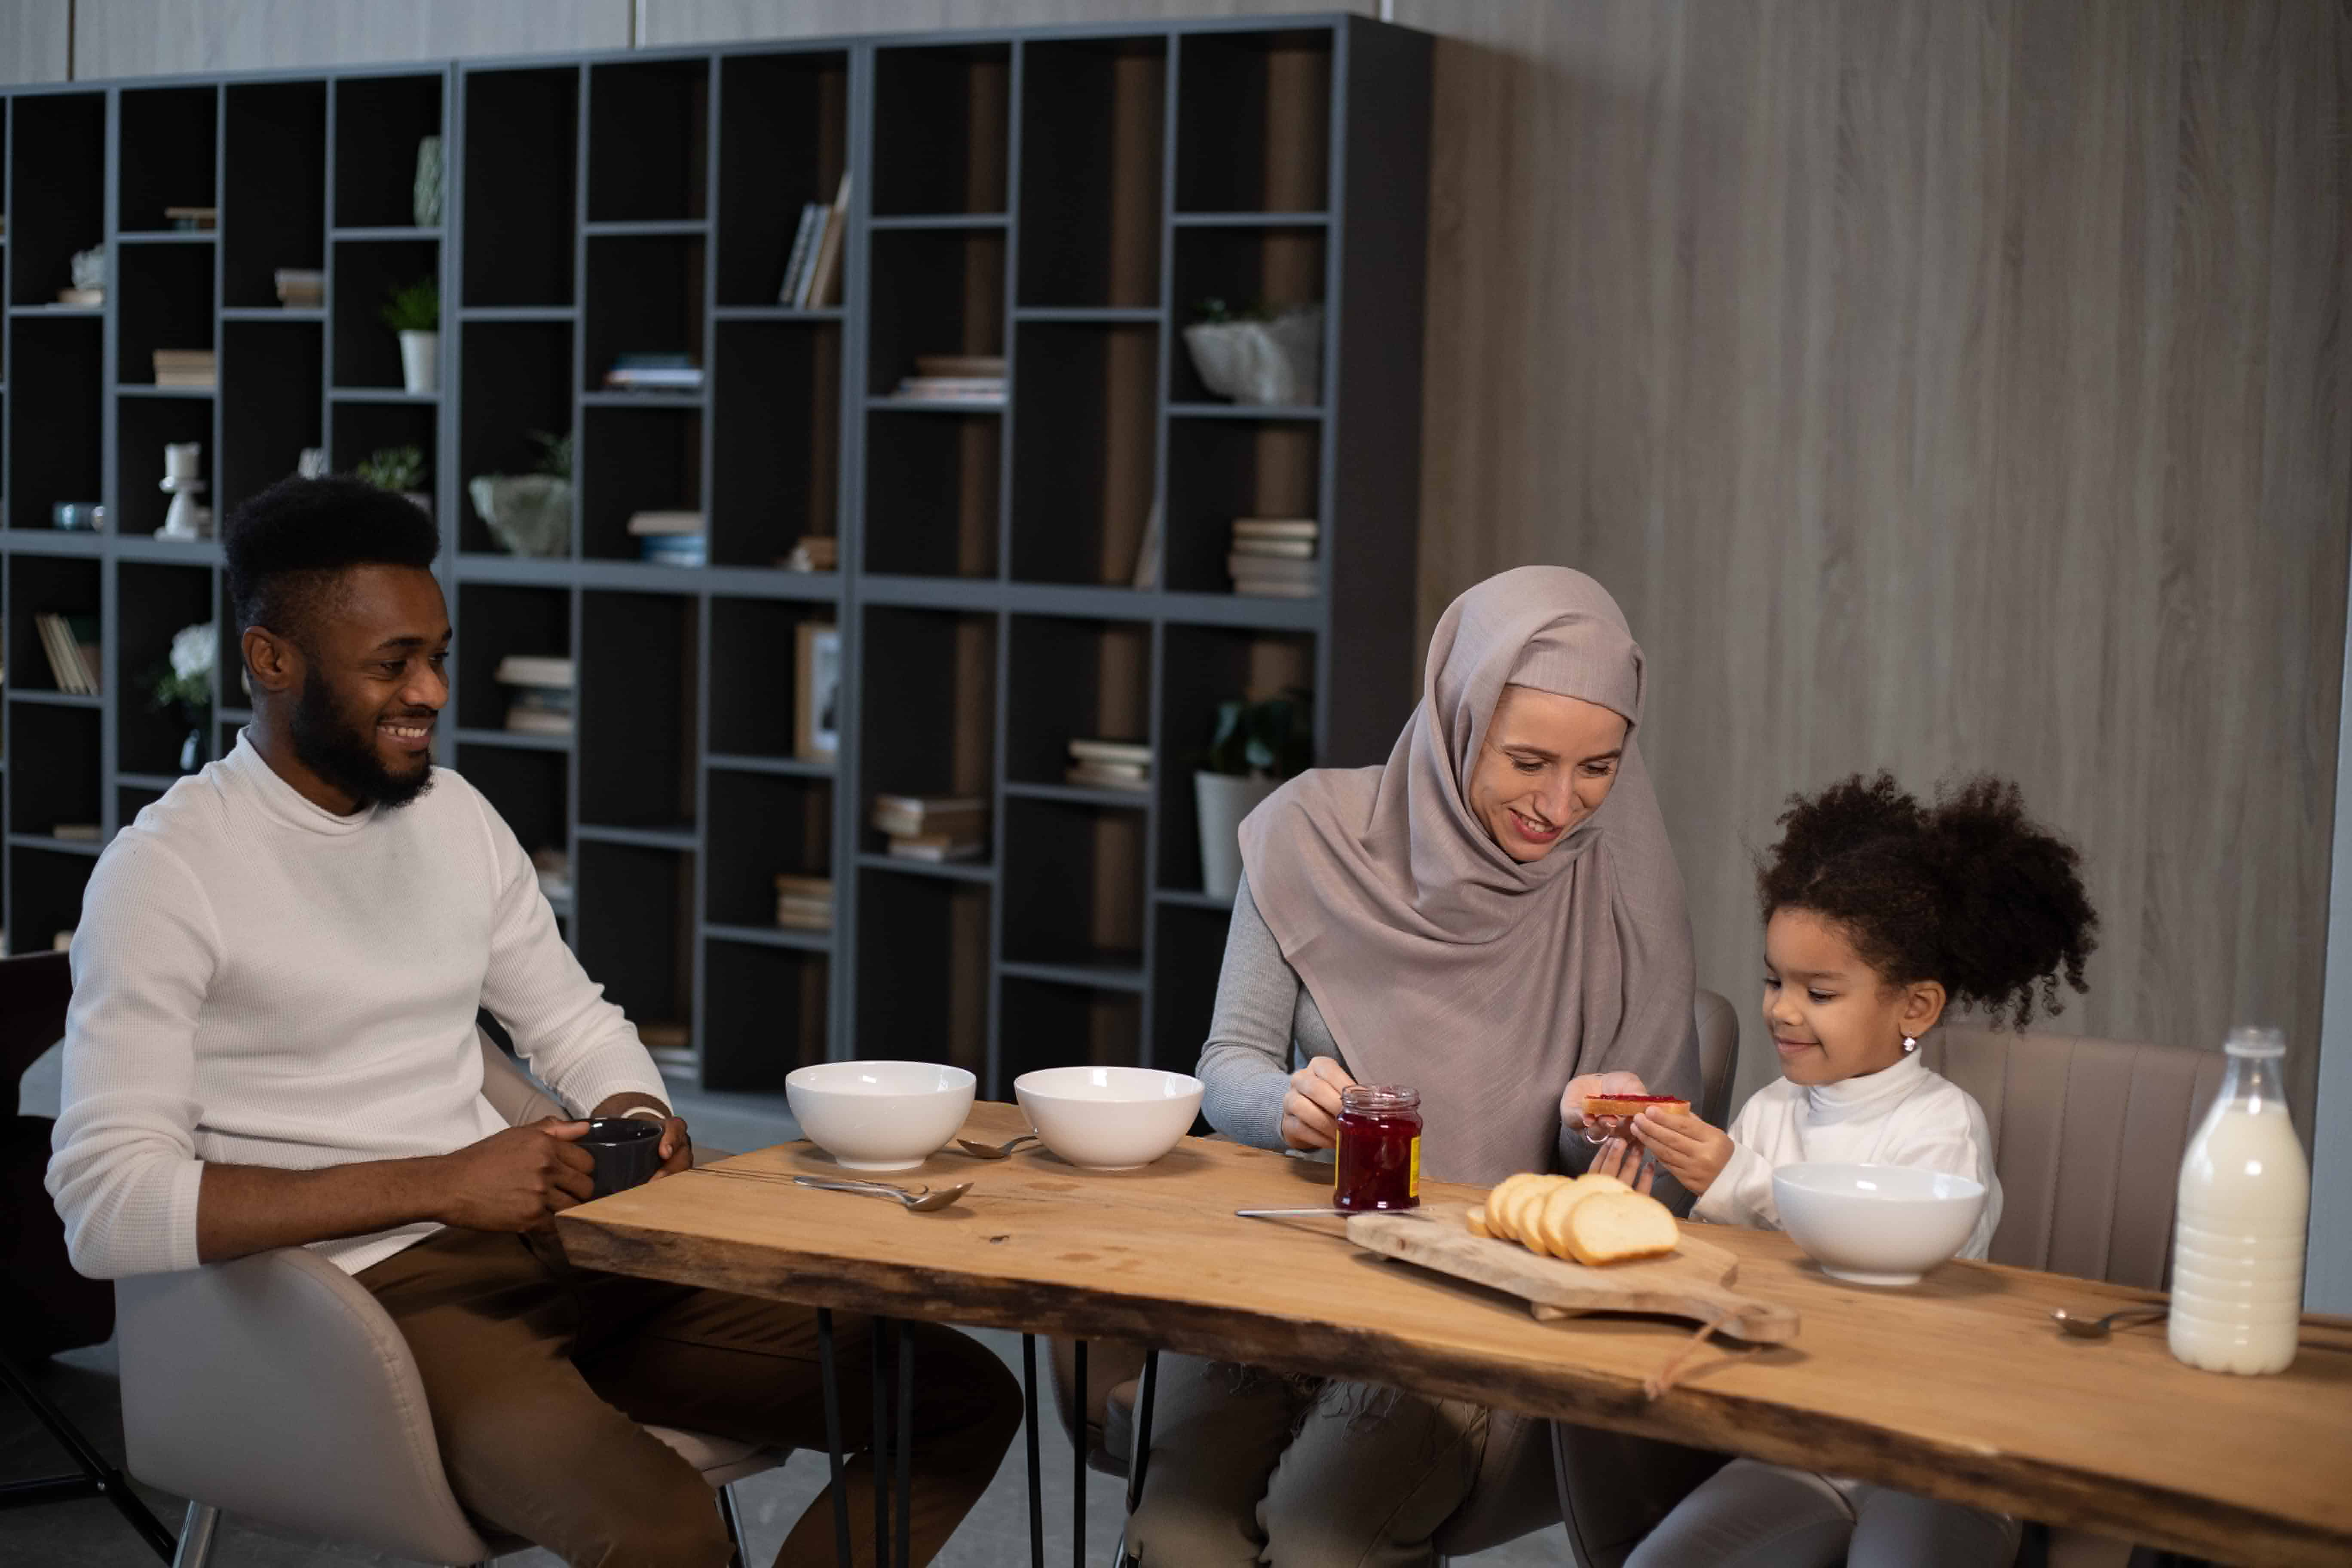 Tidak Mudah, Ini 10 Peran Ayah dalam Keluarga Menurut Islam